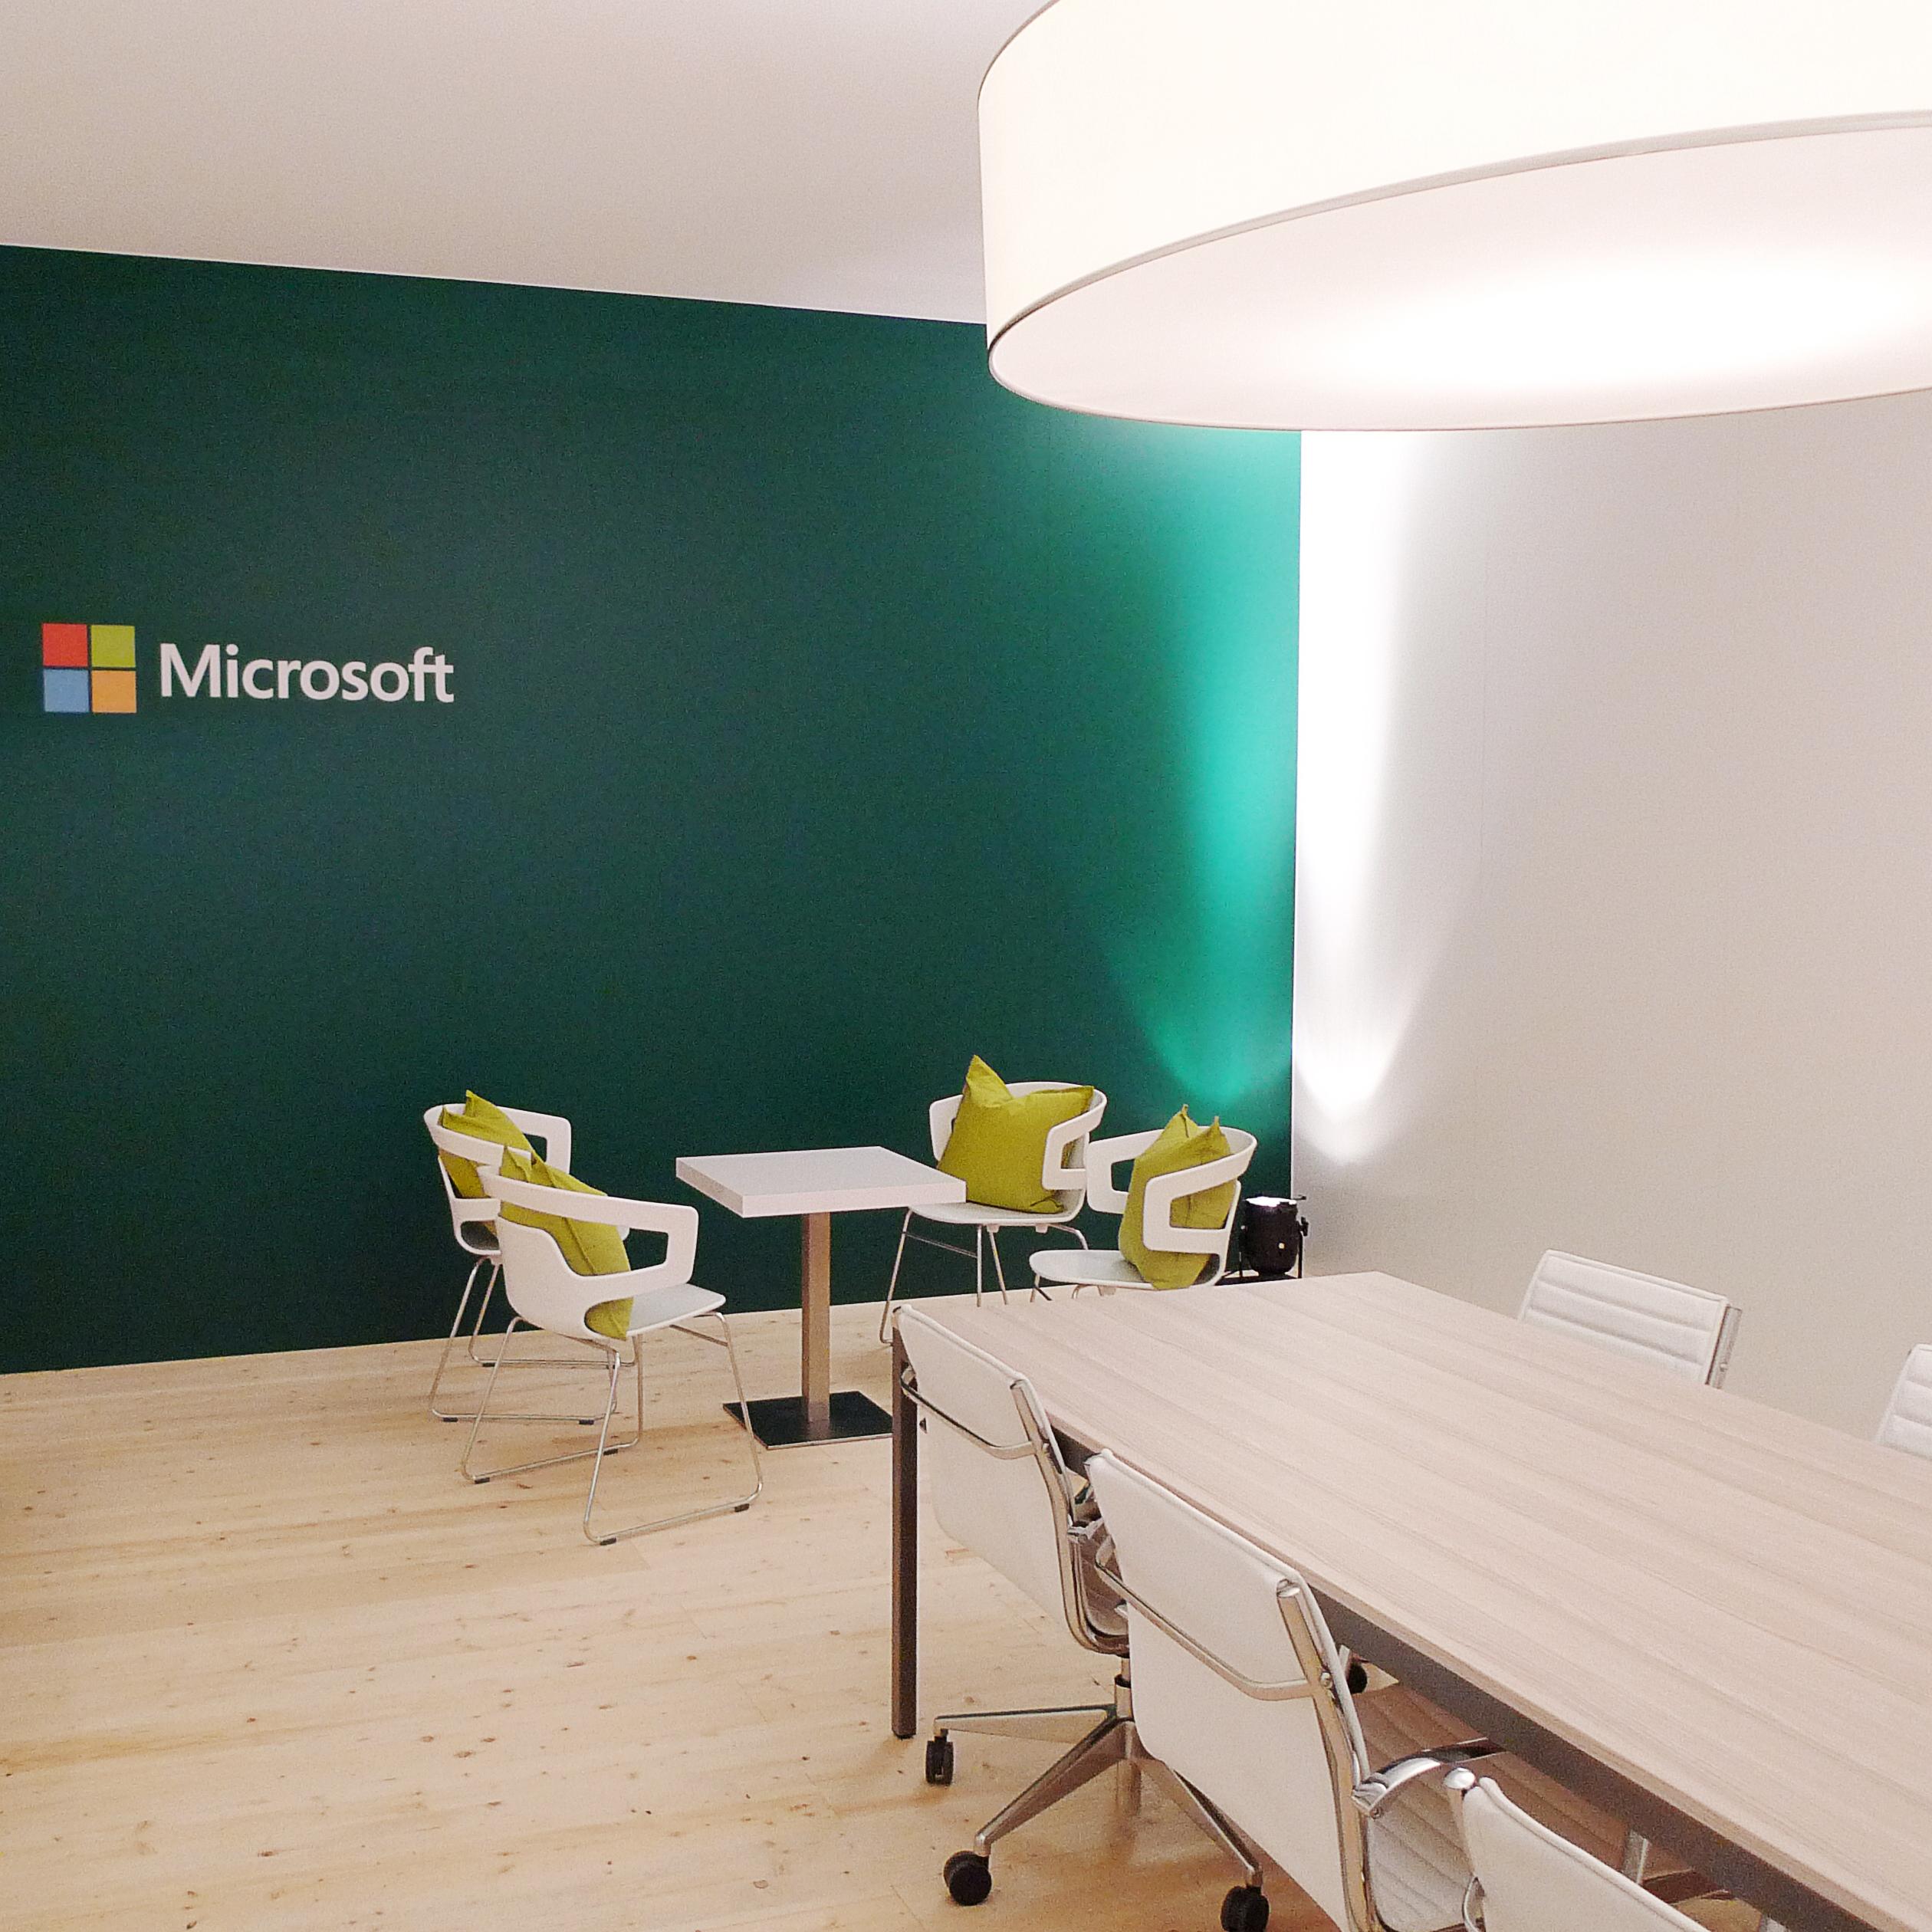 Microsoft WEF 2015